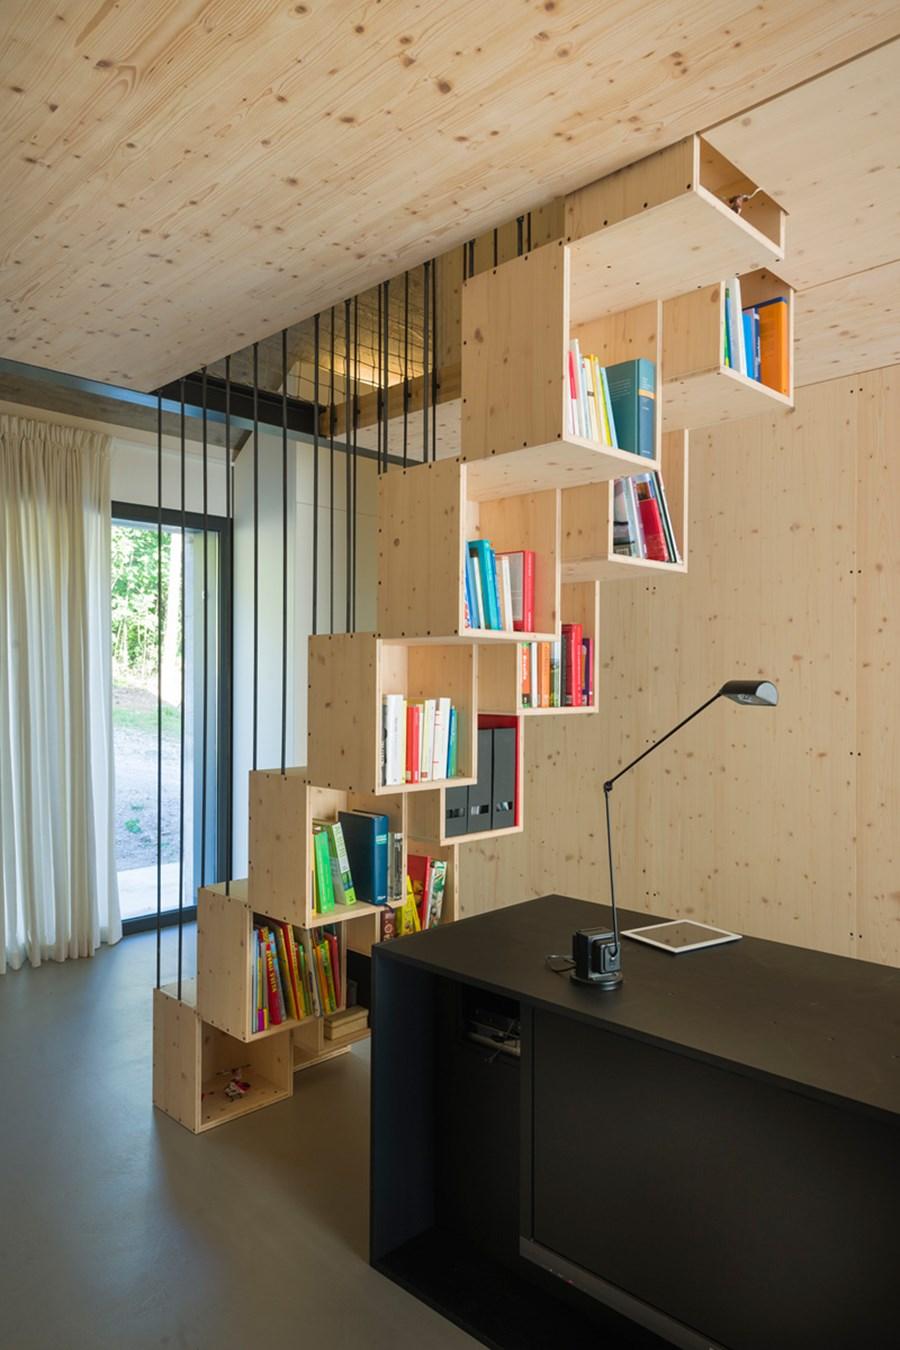 Compact Karst house by Dekleva Gregoric Arhitekti 05